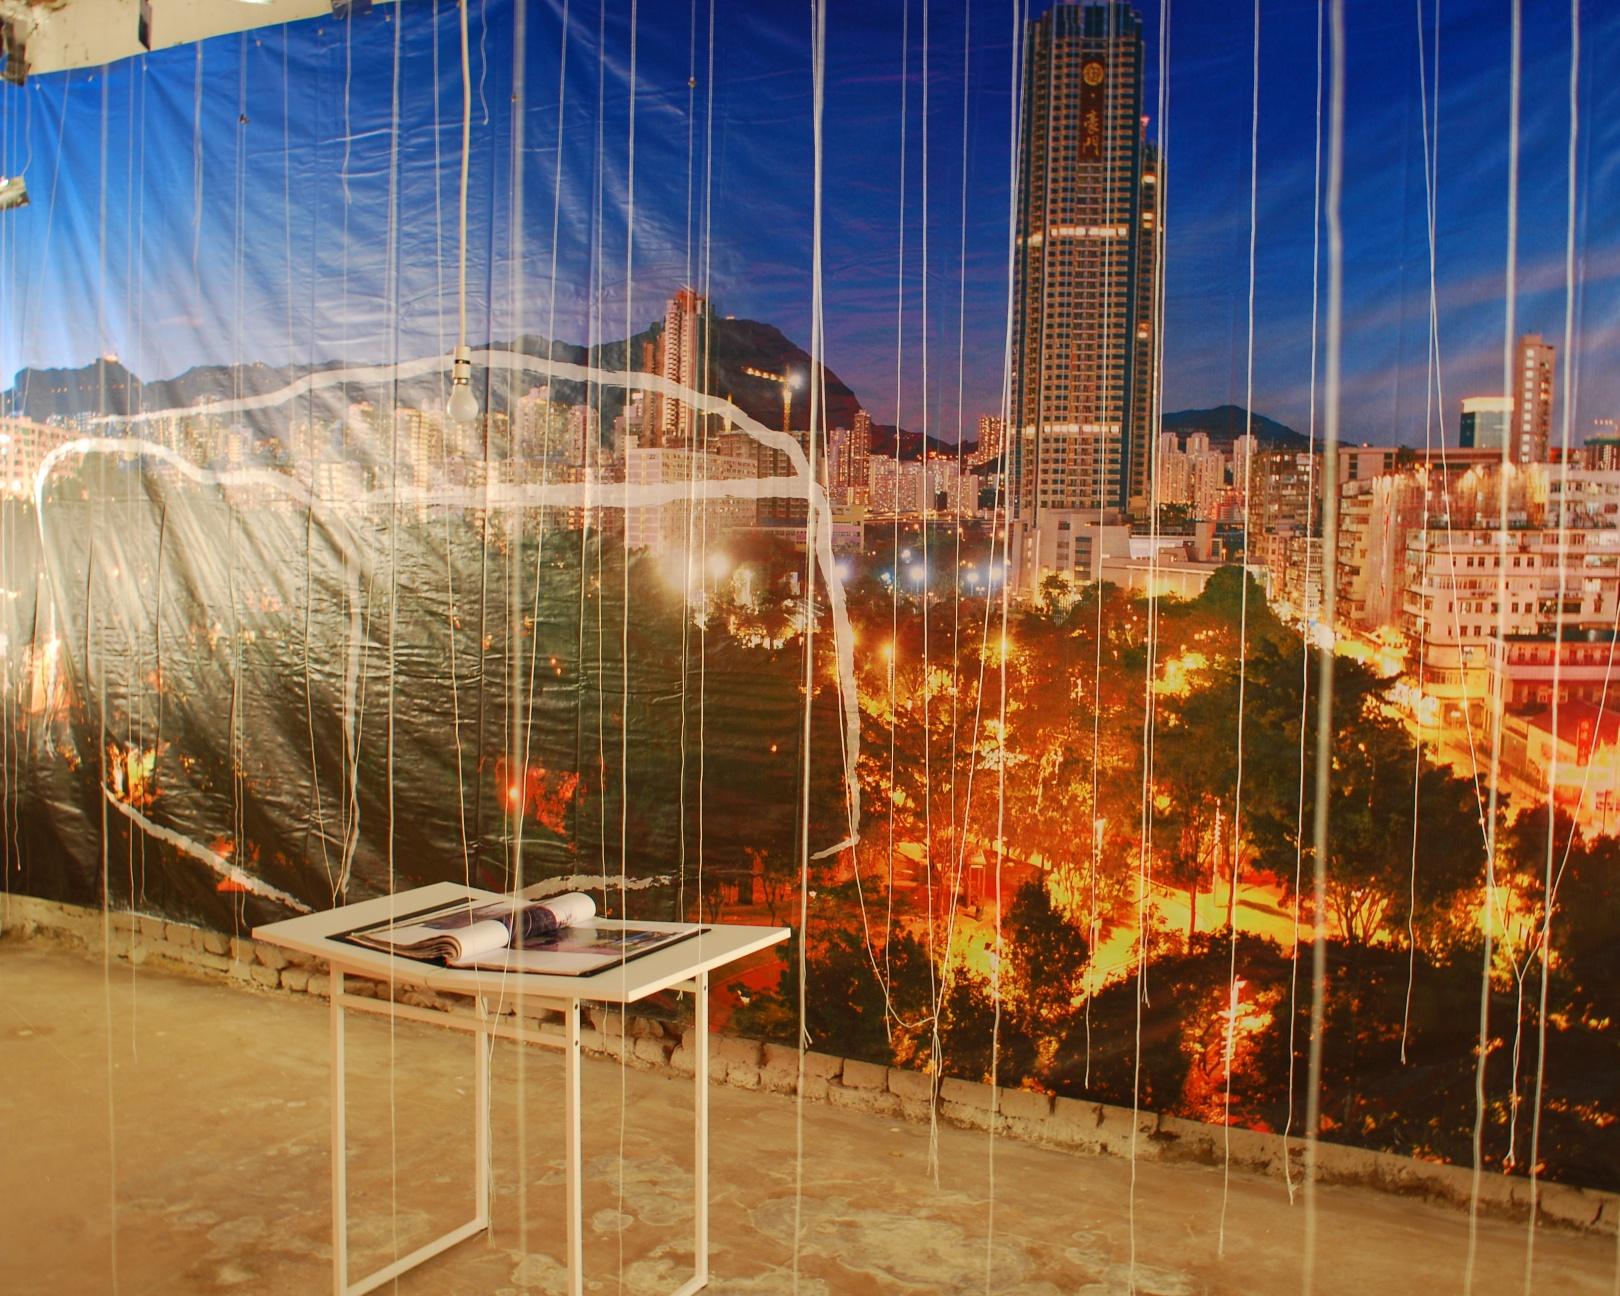 Quotidian Architectures: Hong Kong in Venice, November 18, 2010 | © Courtesy of Nicholas Ng.